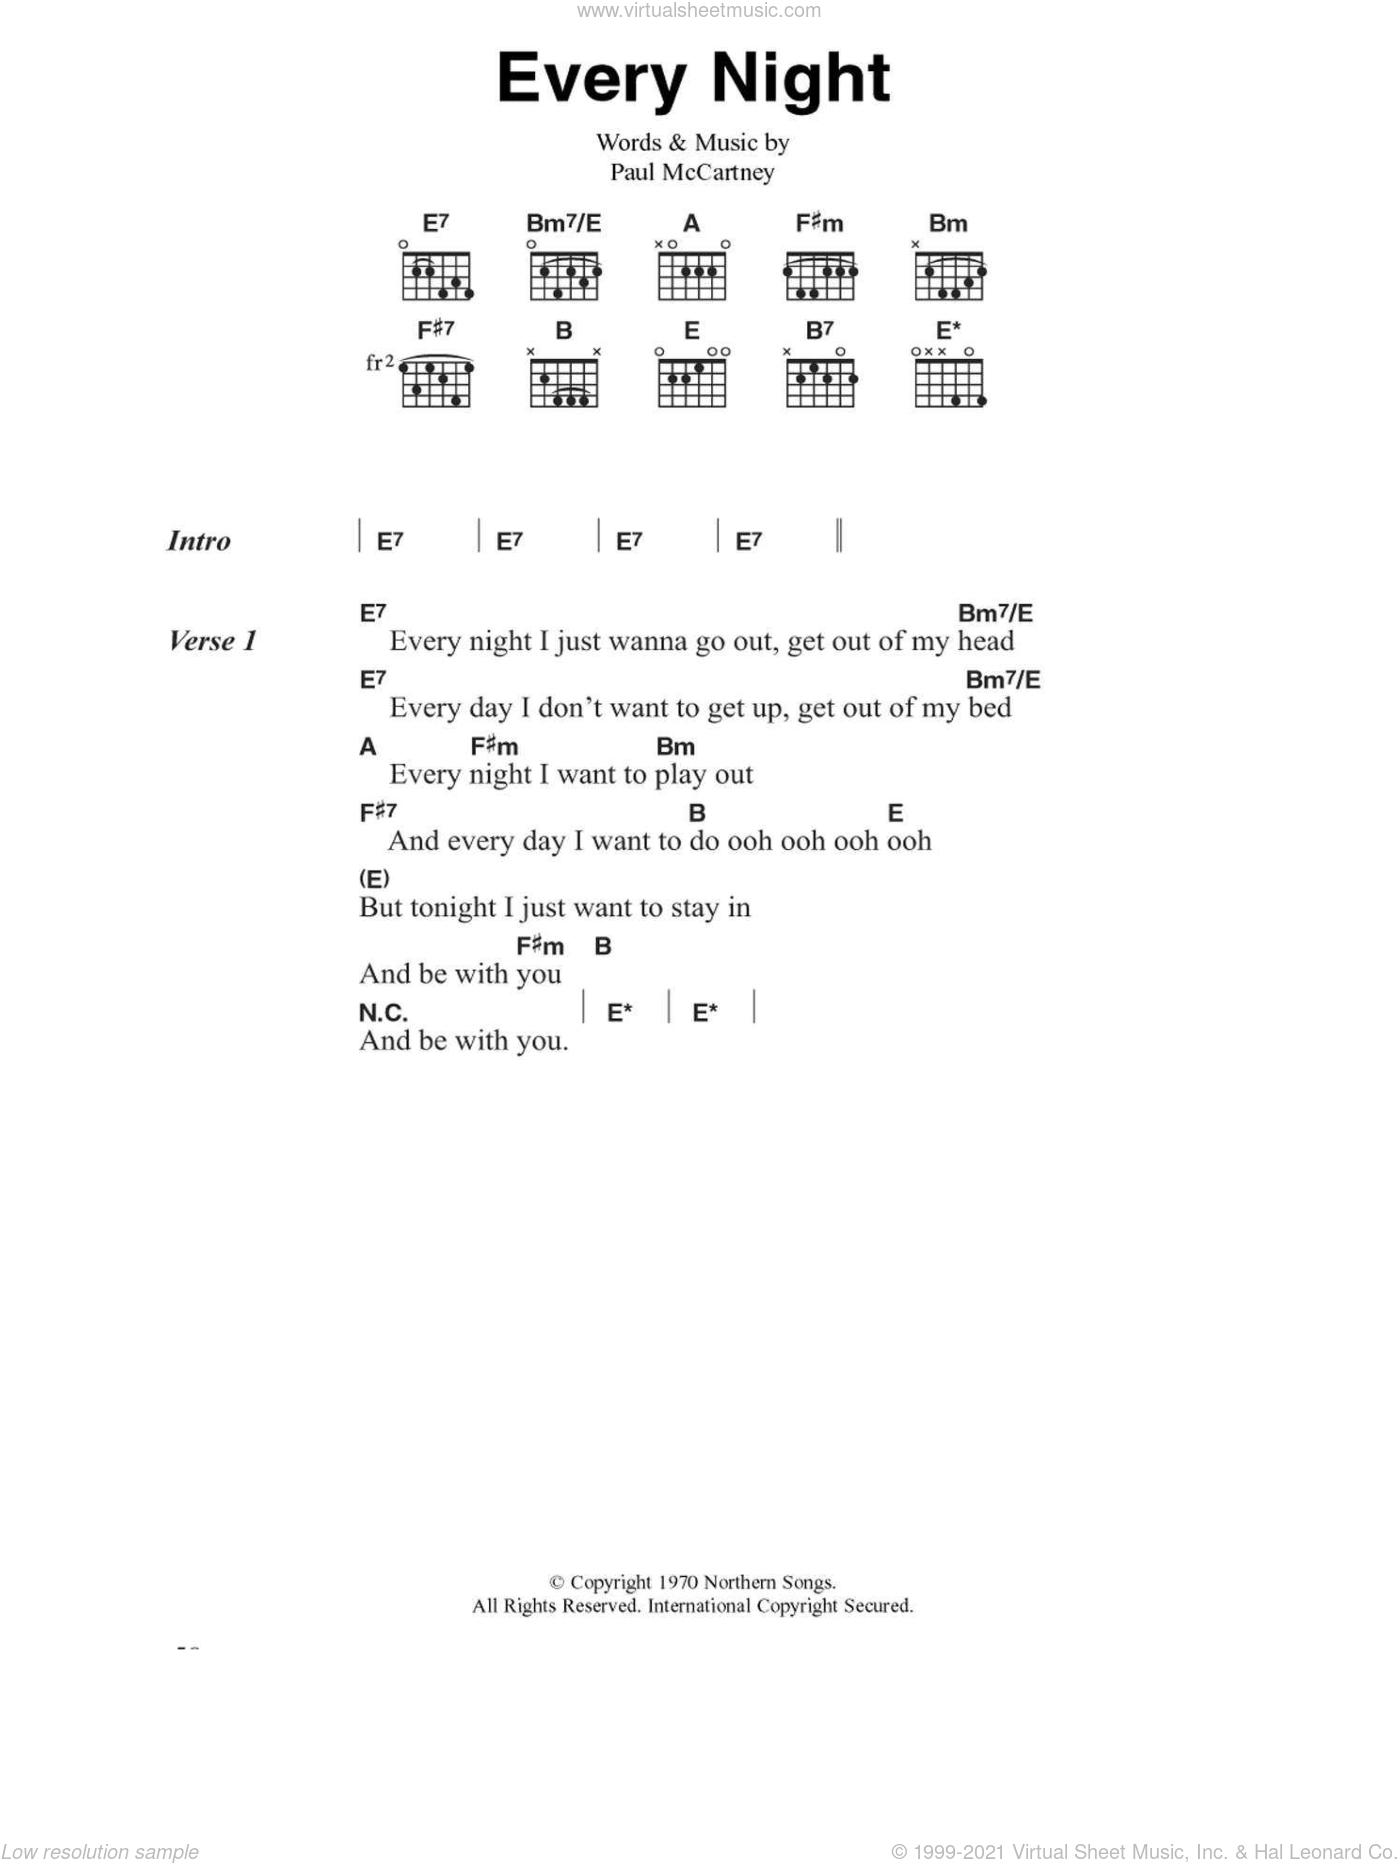 Every Night sheet music for guitar (chords) by Paul McCartney, intermediate skill level